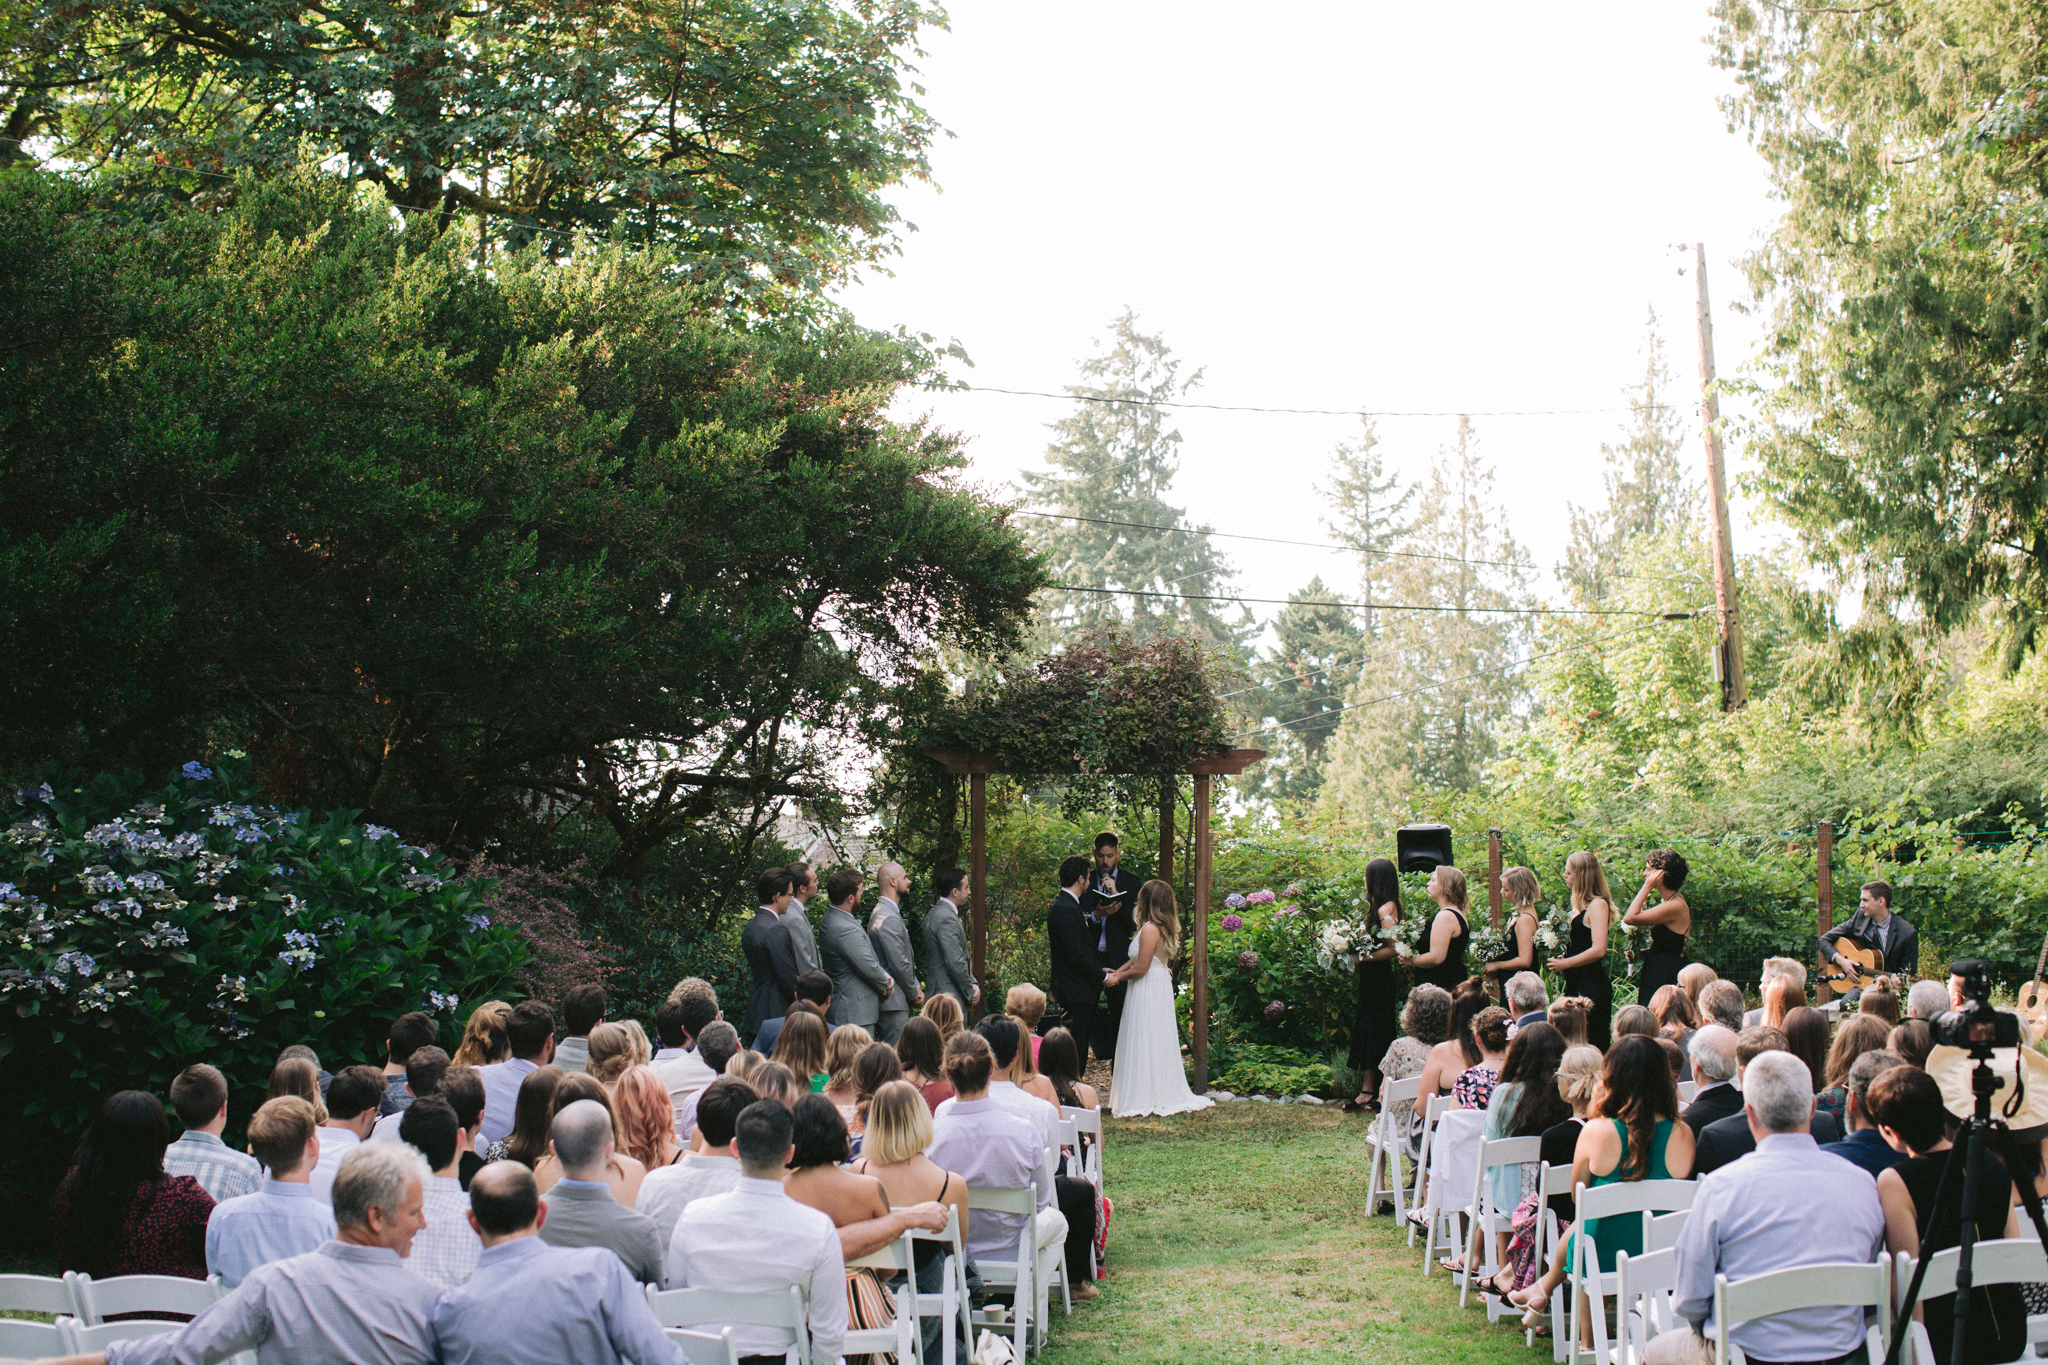 Backyard-Bainbridge-Island-Wedding-Alycia-Lovell-Photography-104.JPG